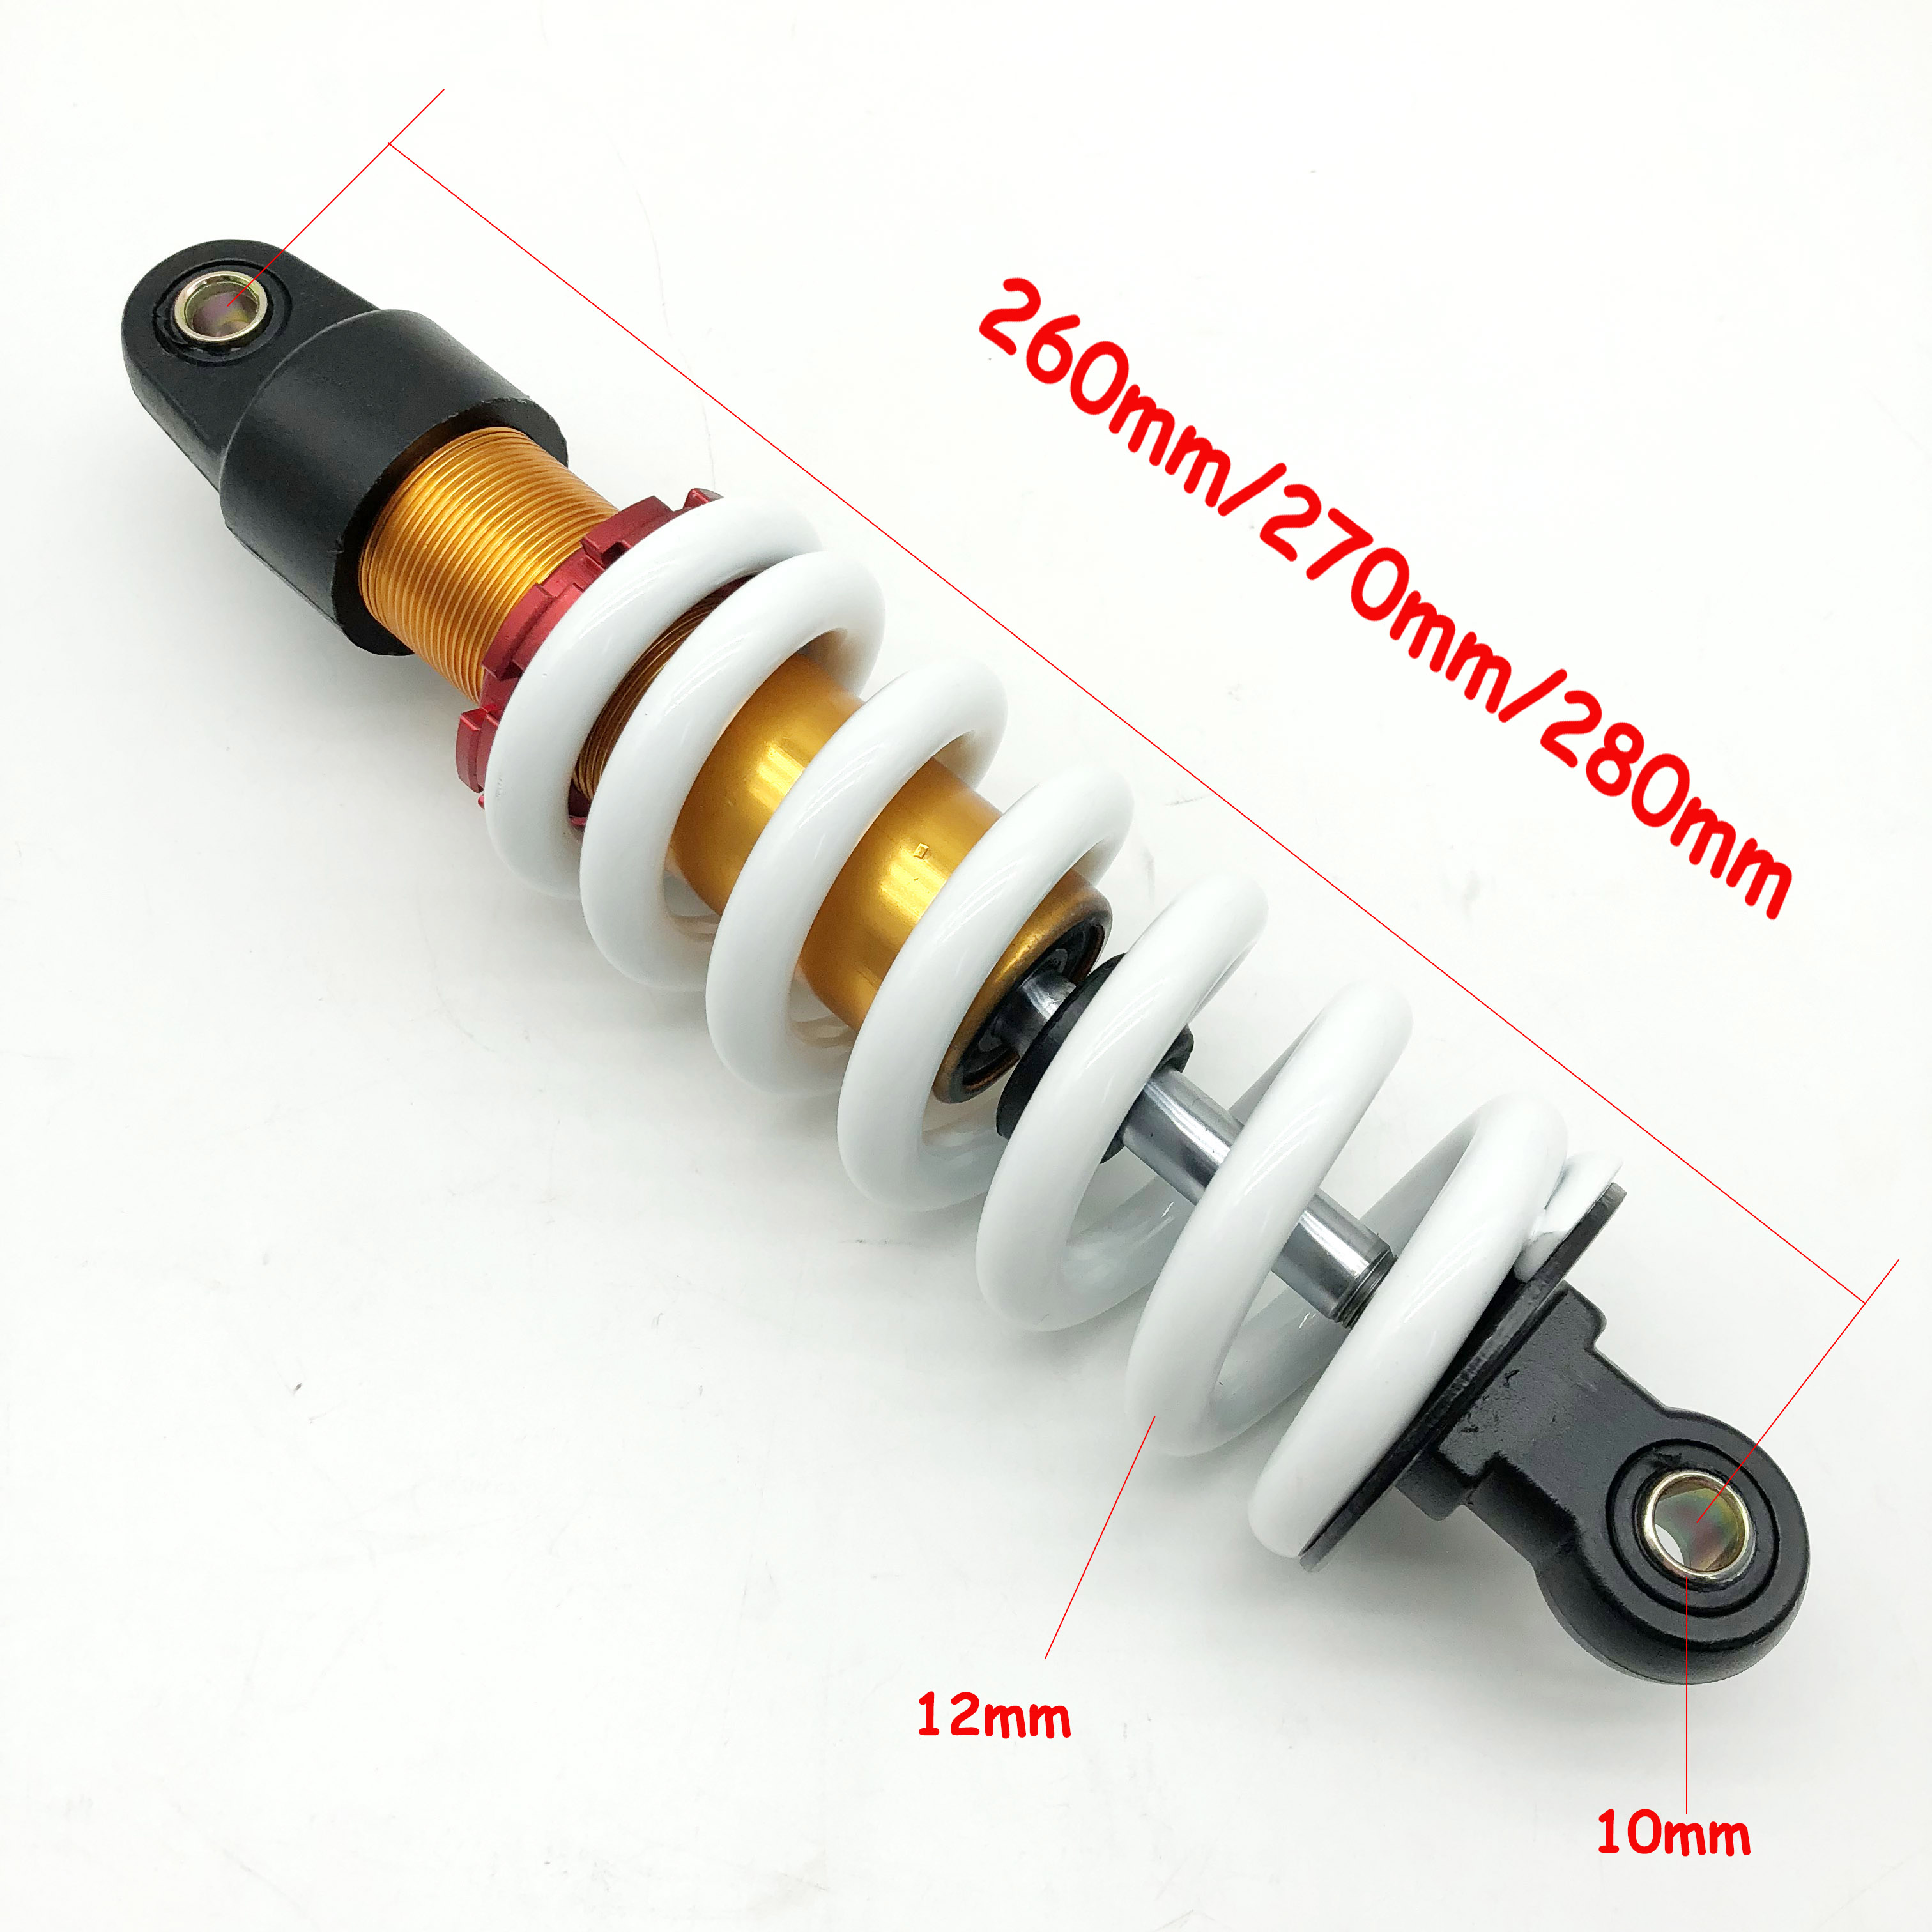 Motocycle Shock Damper Spring Rear Suspension fit for 70CC 90CC 110CC 125CC 140CC 200CC Dirt Pit Bike Shock Strut